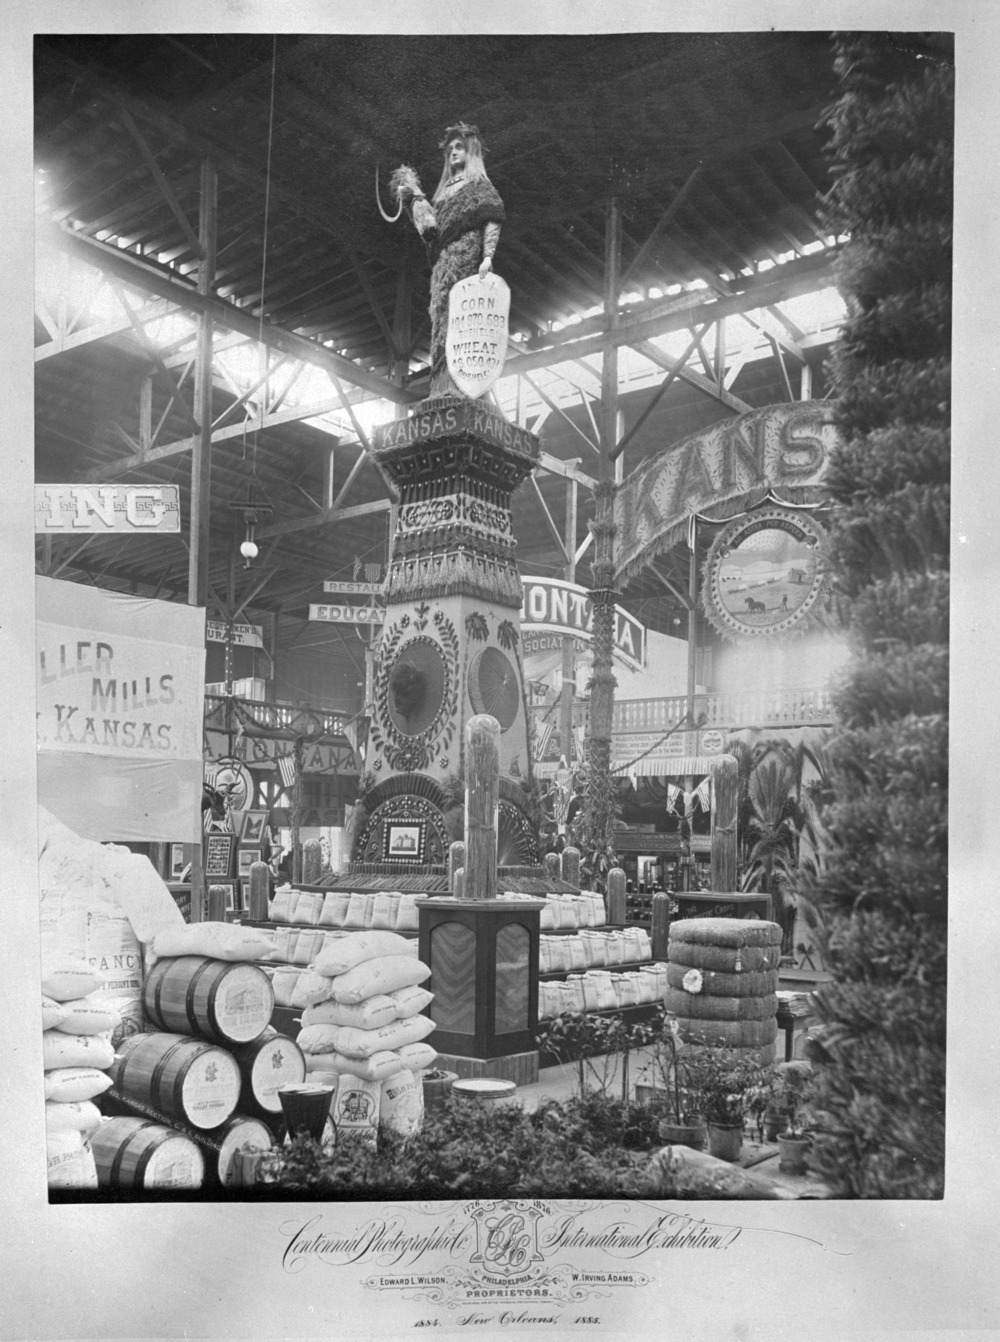 Kansas Exhibit, New Orleans Cotton Centennial